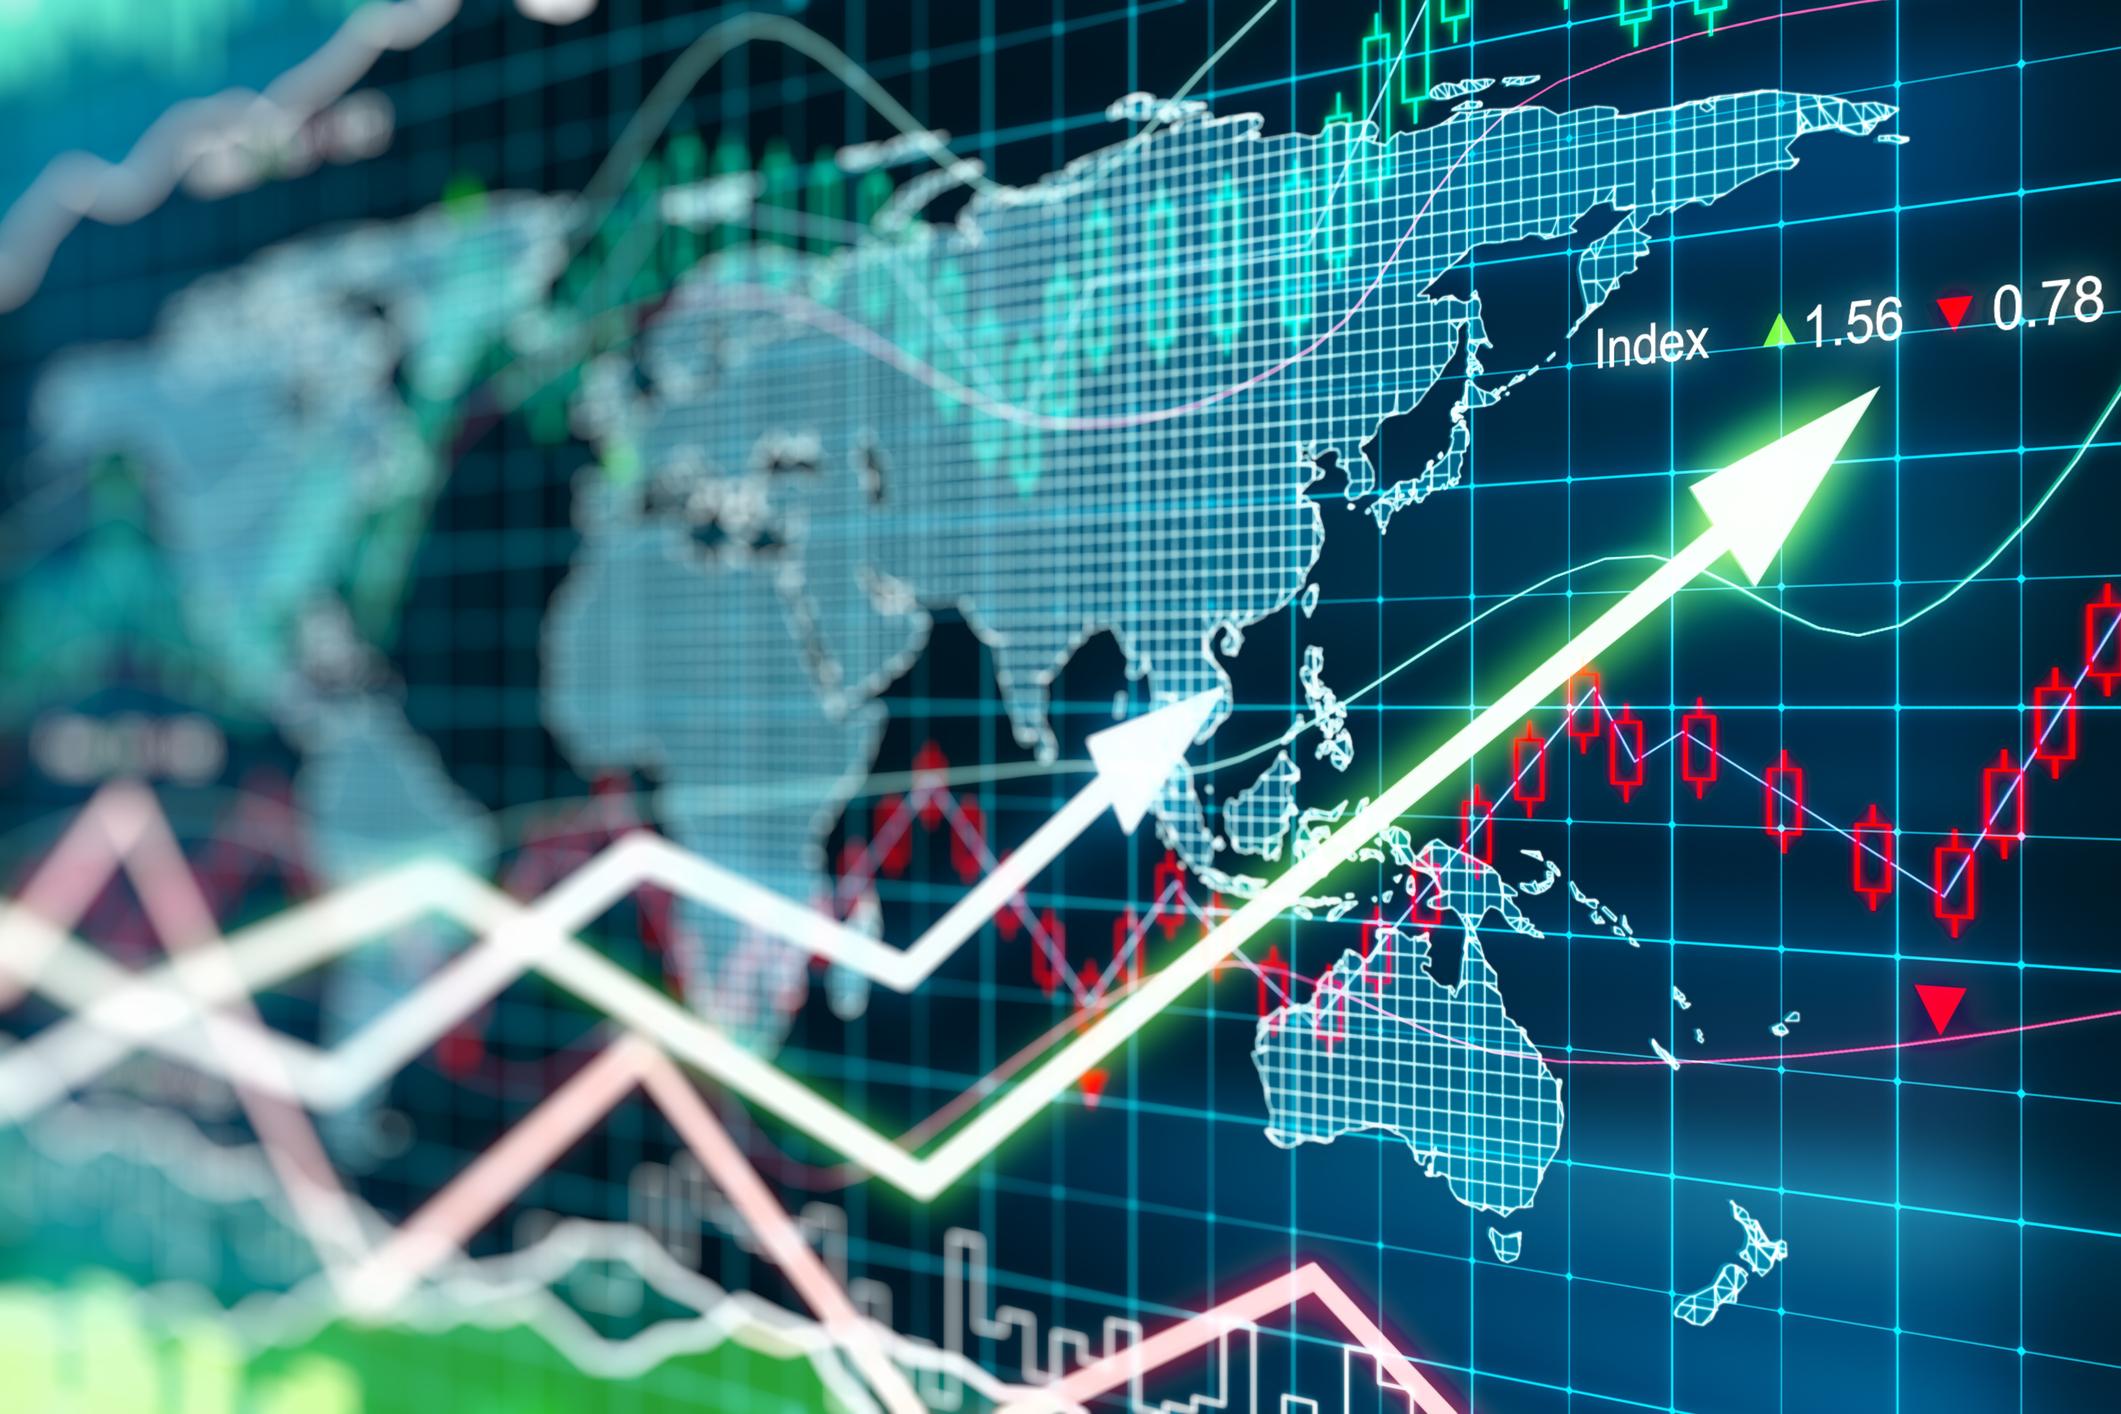 Positive stock market charts overlaying a digital world map